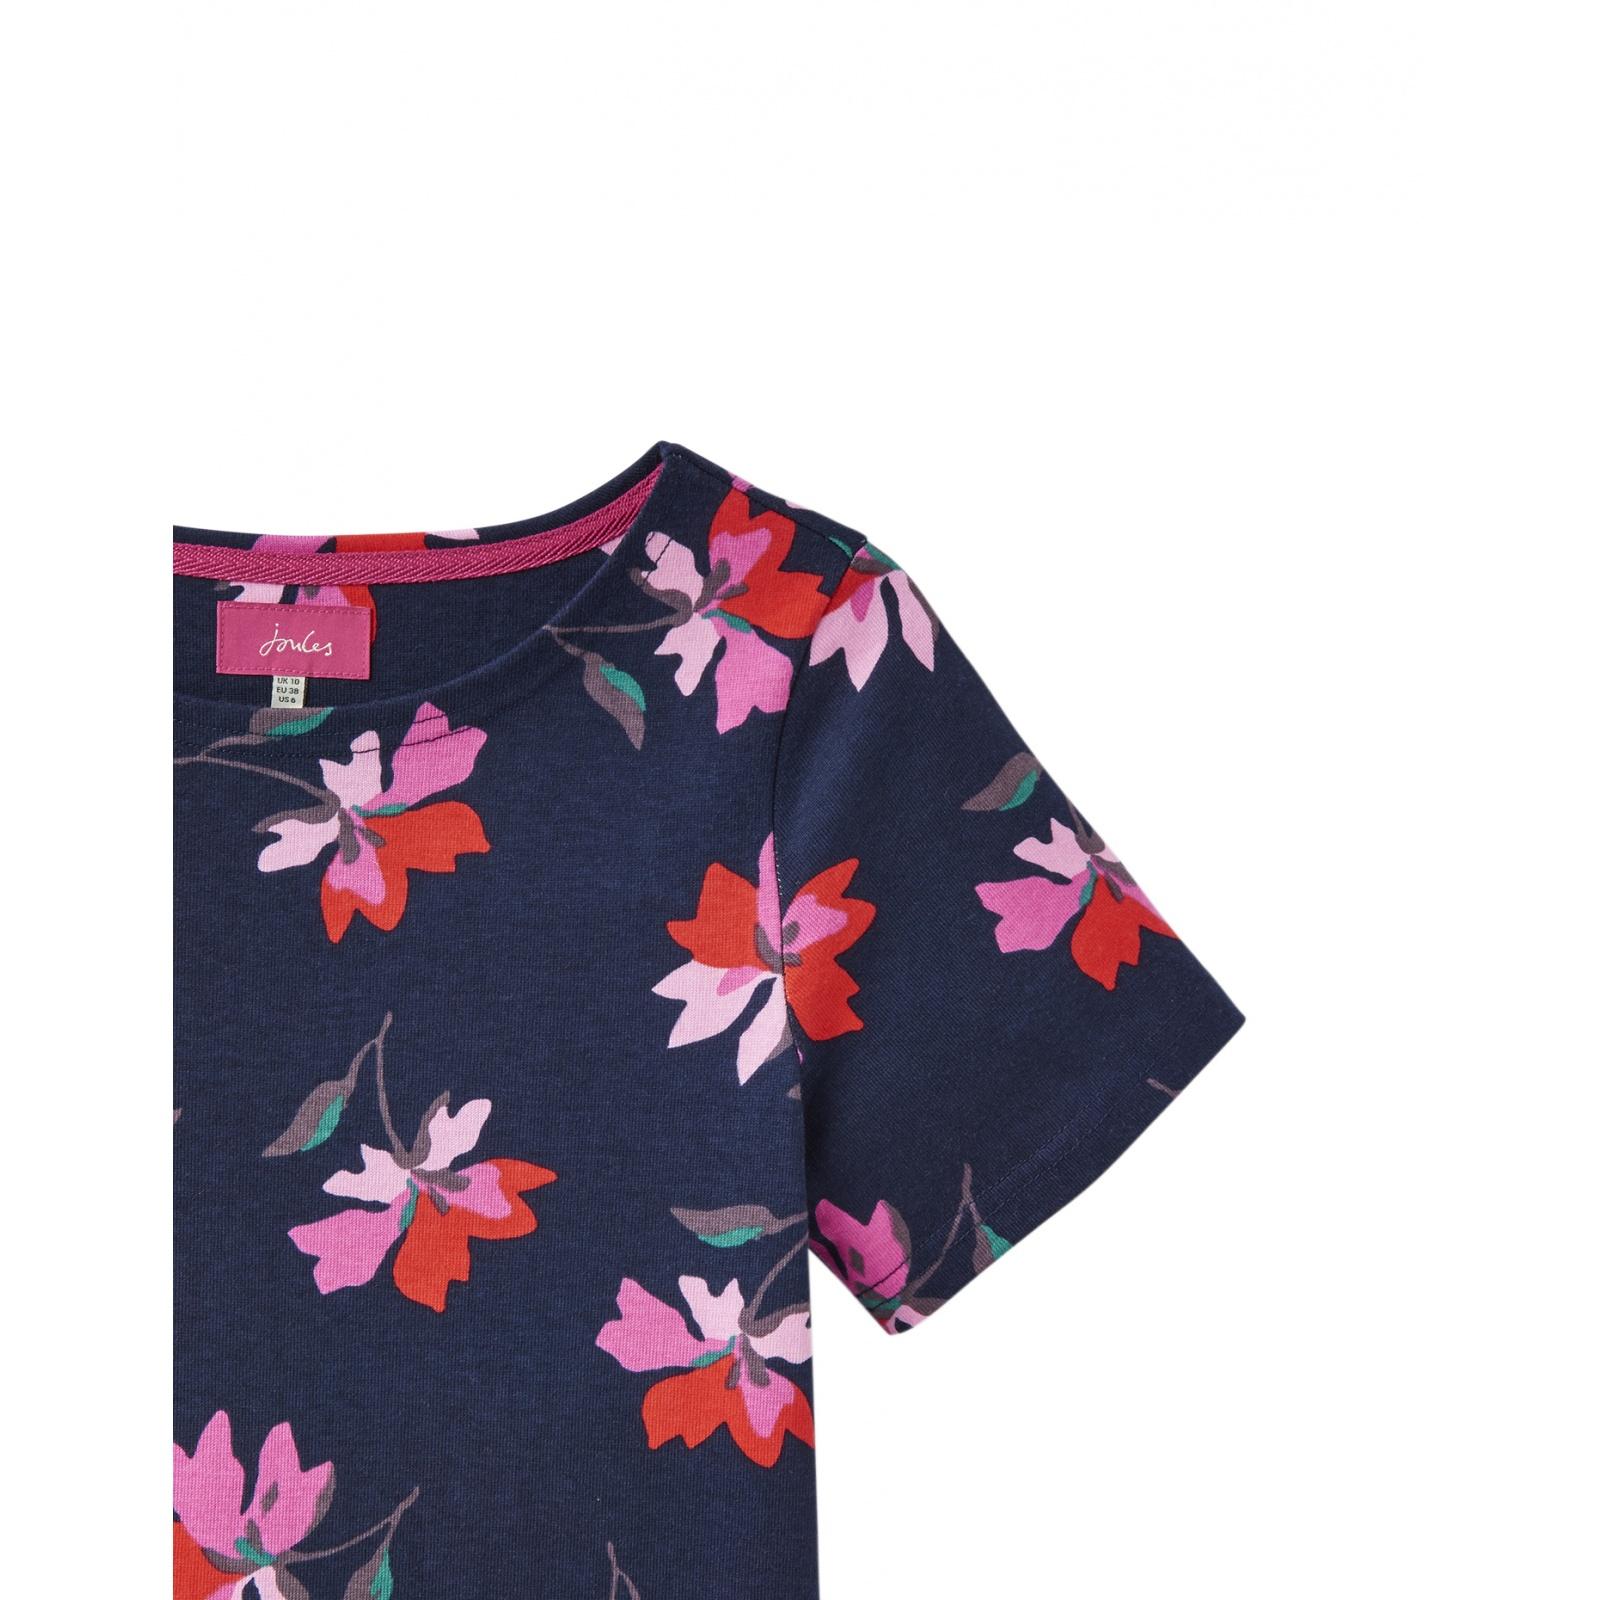 Joules-Riviera-Print-T-Shirt-Dress-with-Short-Sleeves-SS19 thumbnail 23